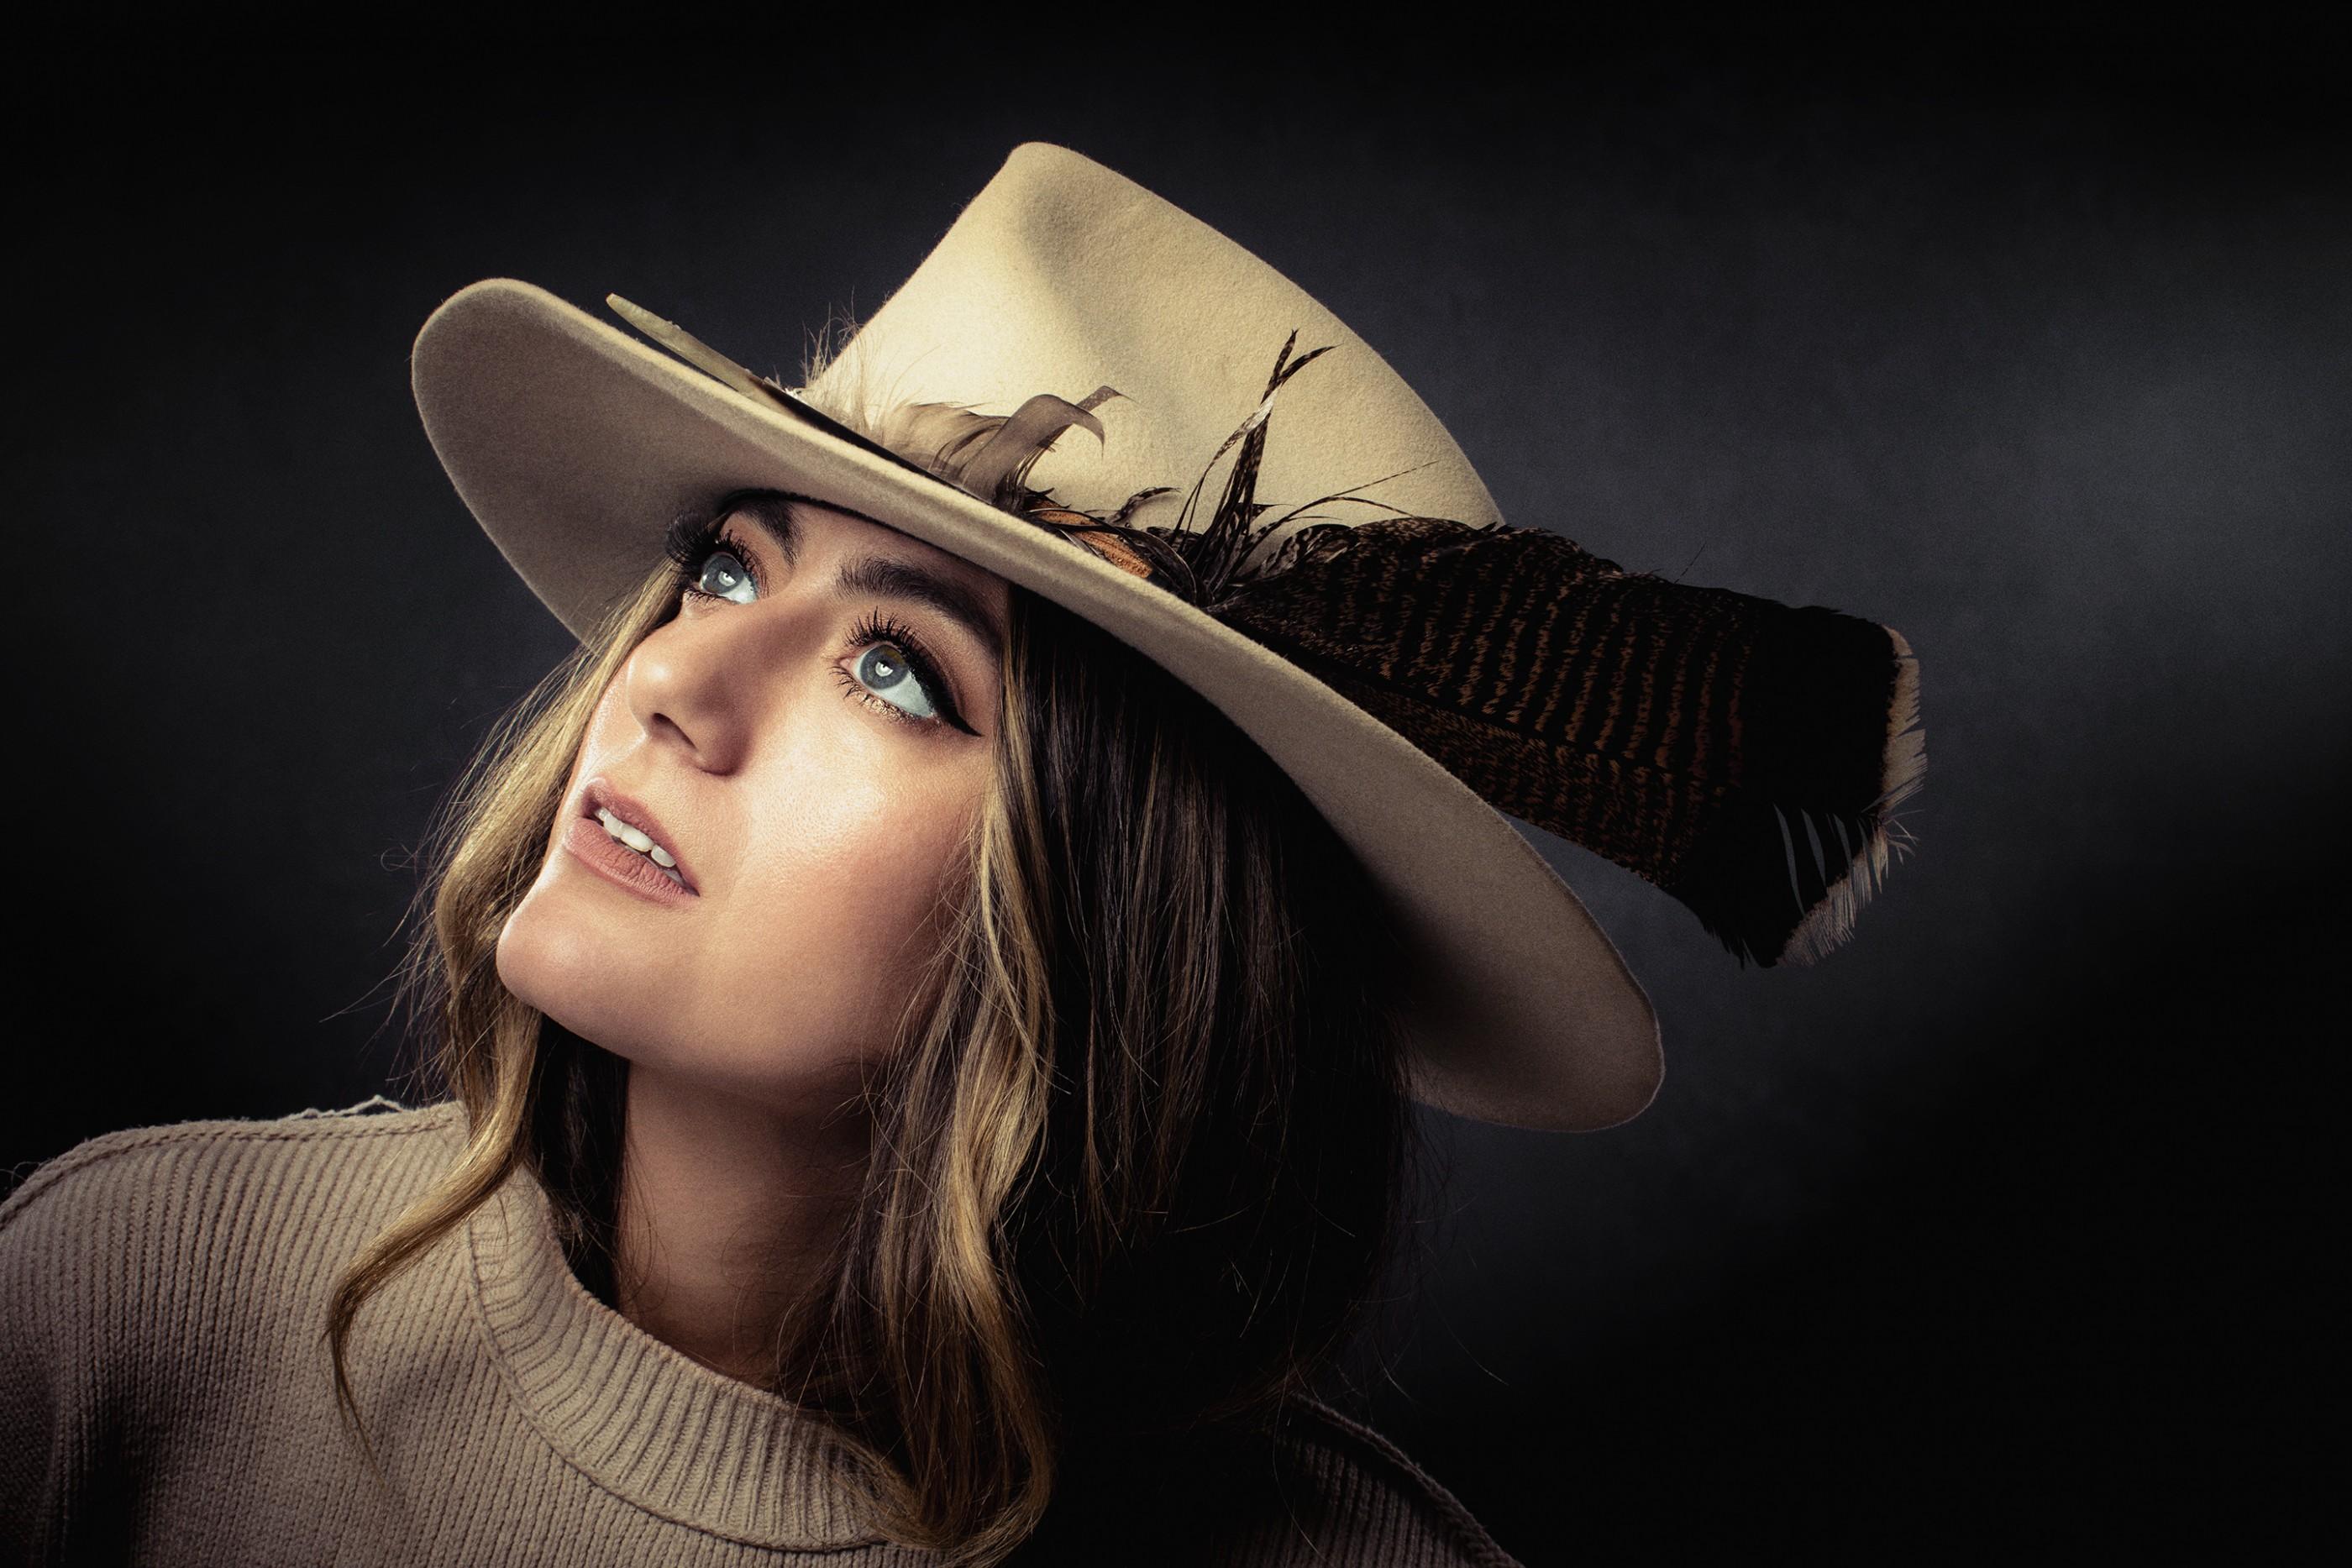 alyssa-bonagura-feather-hat-ash-newell